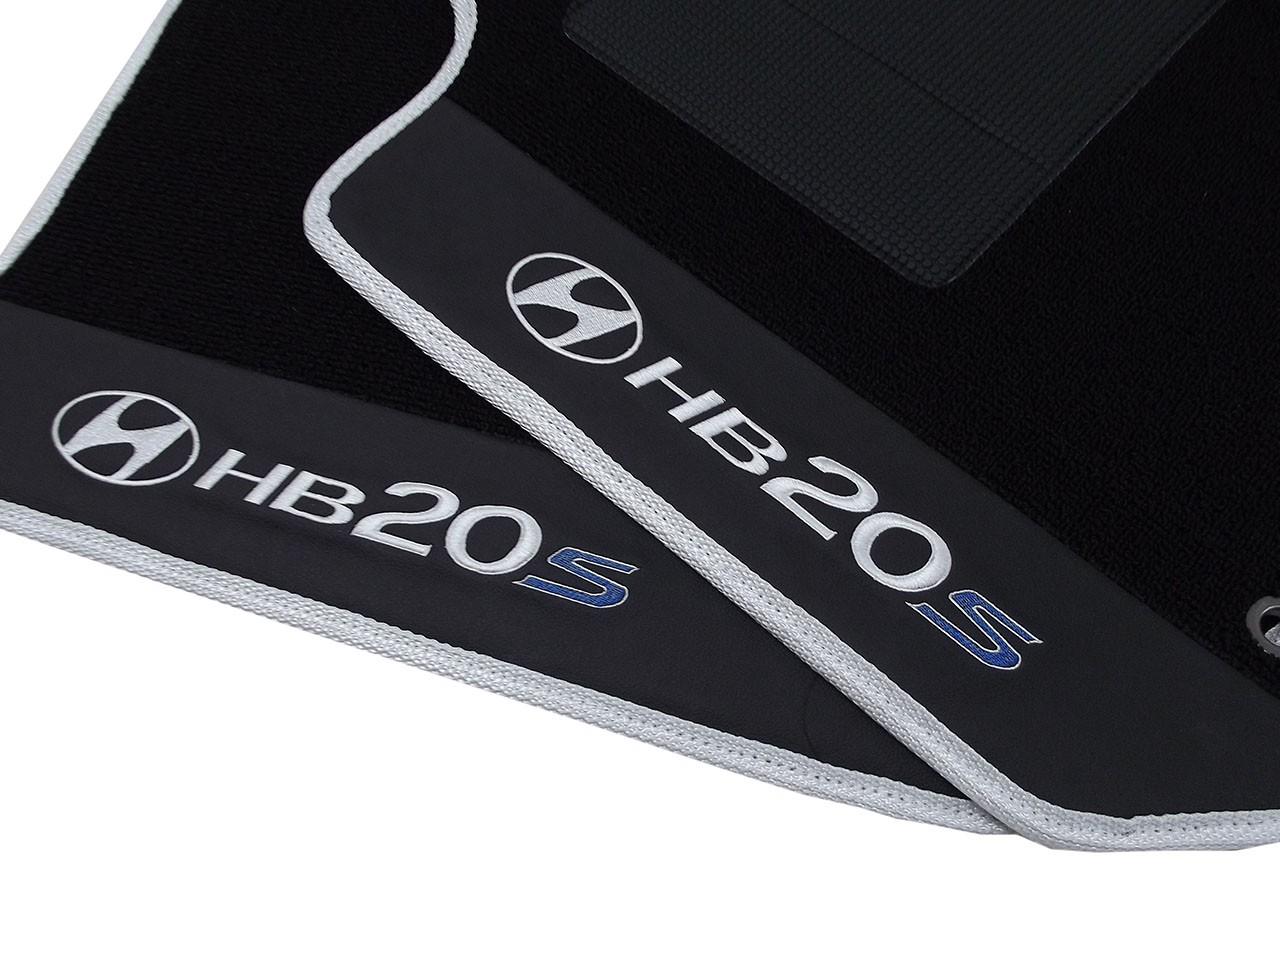 Kit De Tapetes Assoalho Luxo+ Porta Malas Luxo Hyundai Hb20s